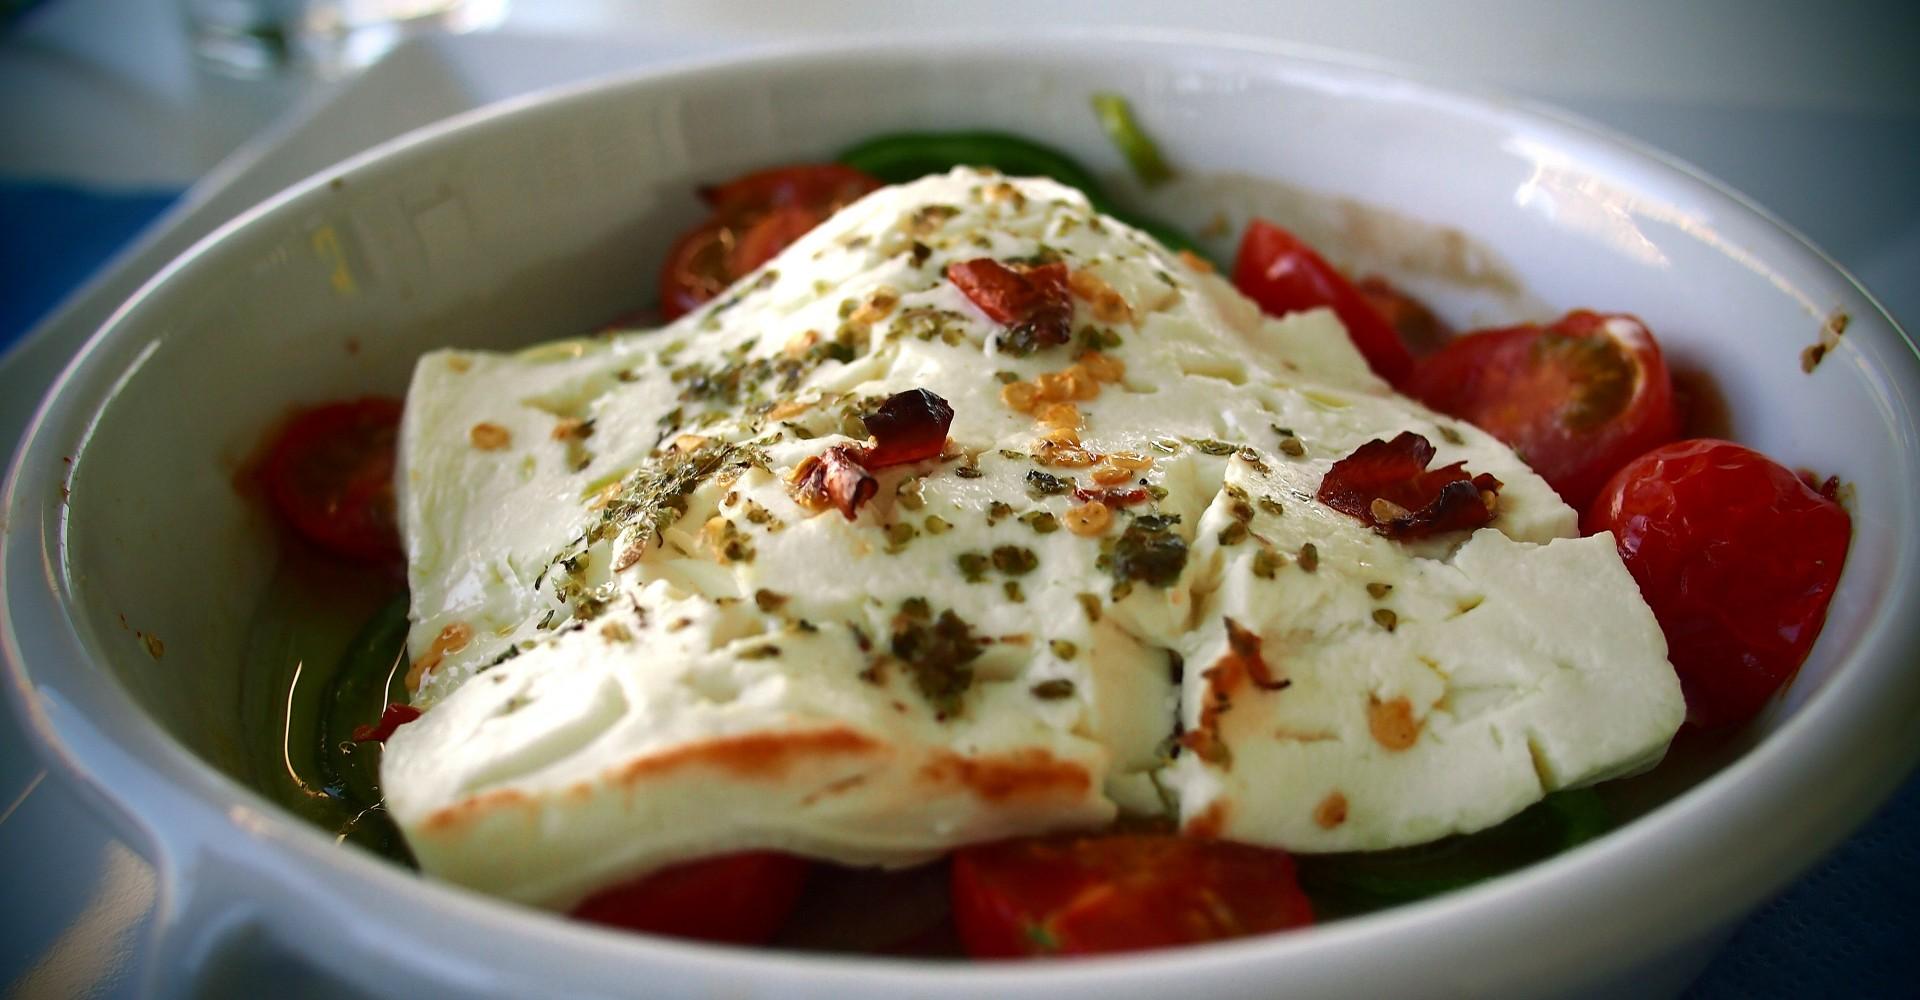 Spicy Baked Feta Recipe (Bouyiourdi)